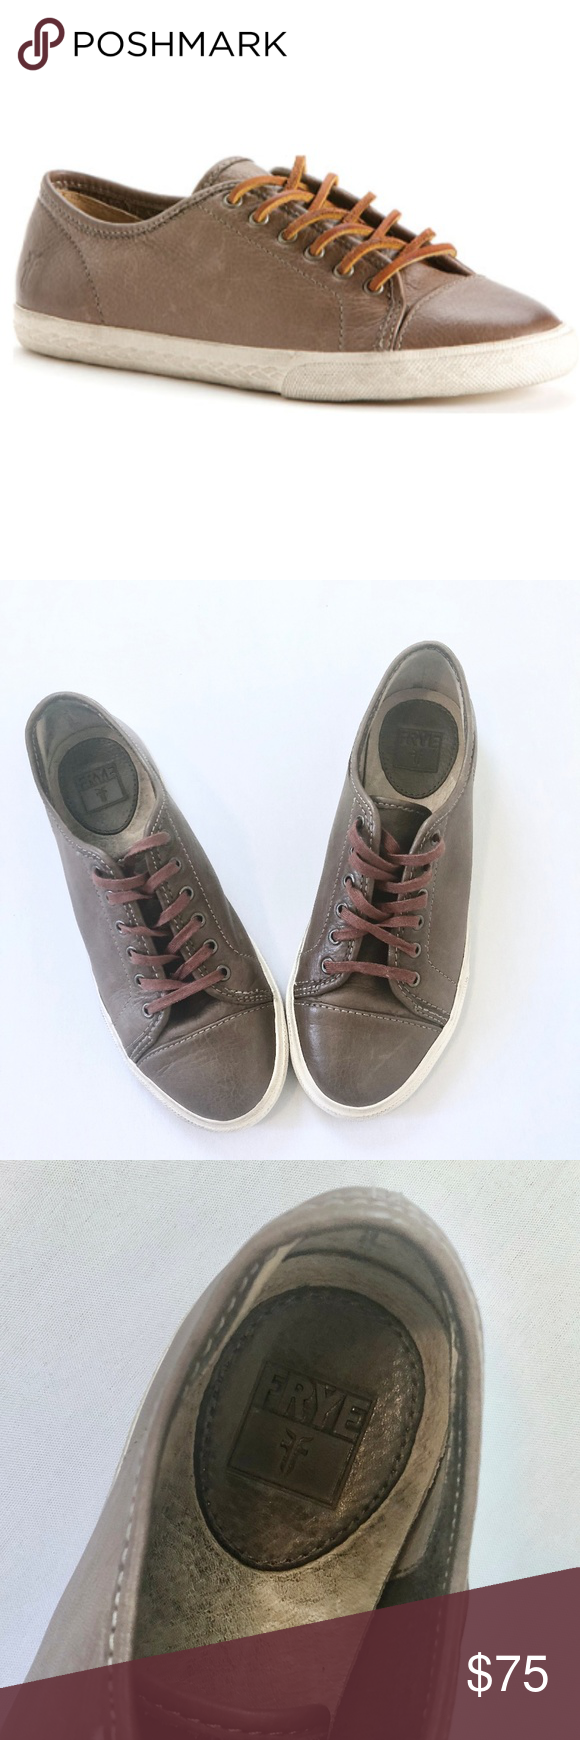 FRYE Mindy Low Lace Leather Sneaker